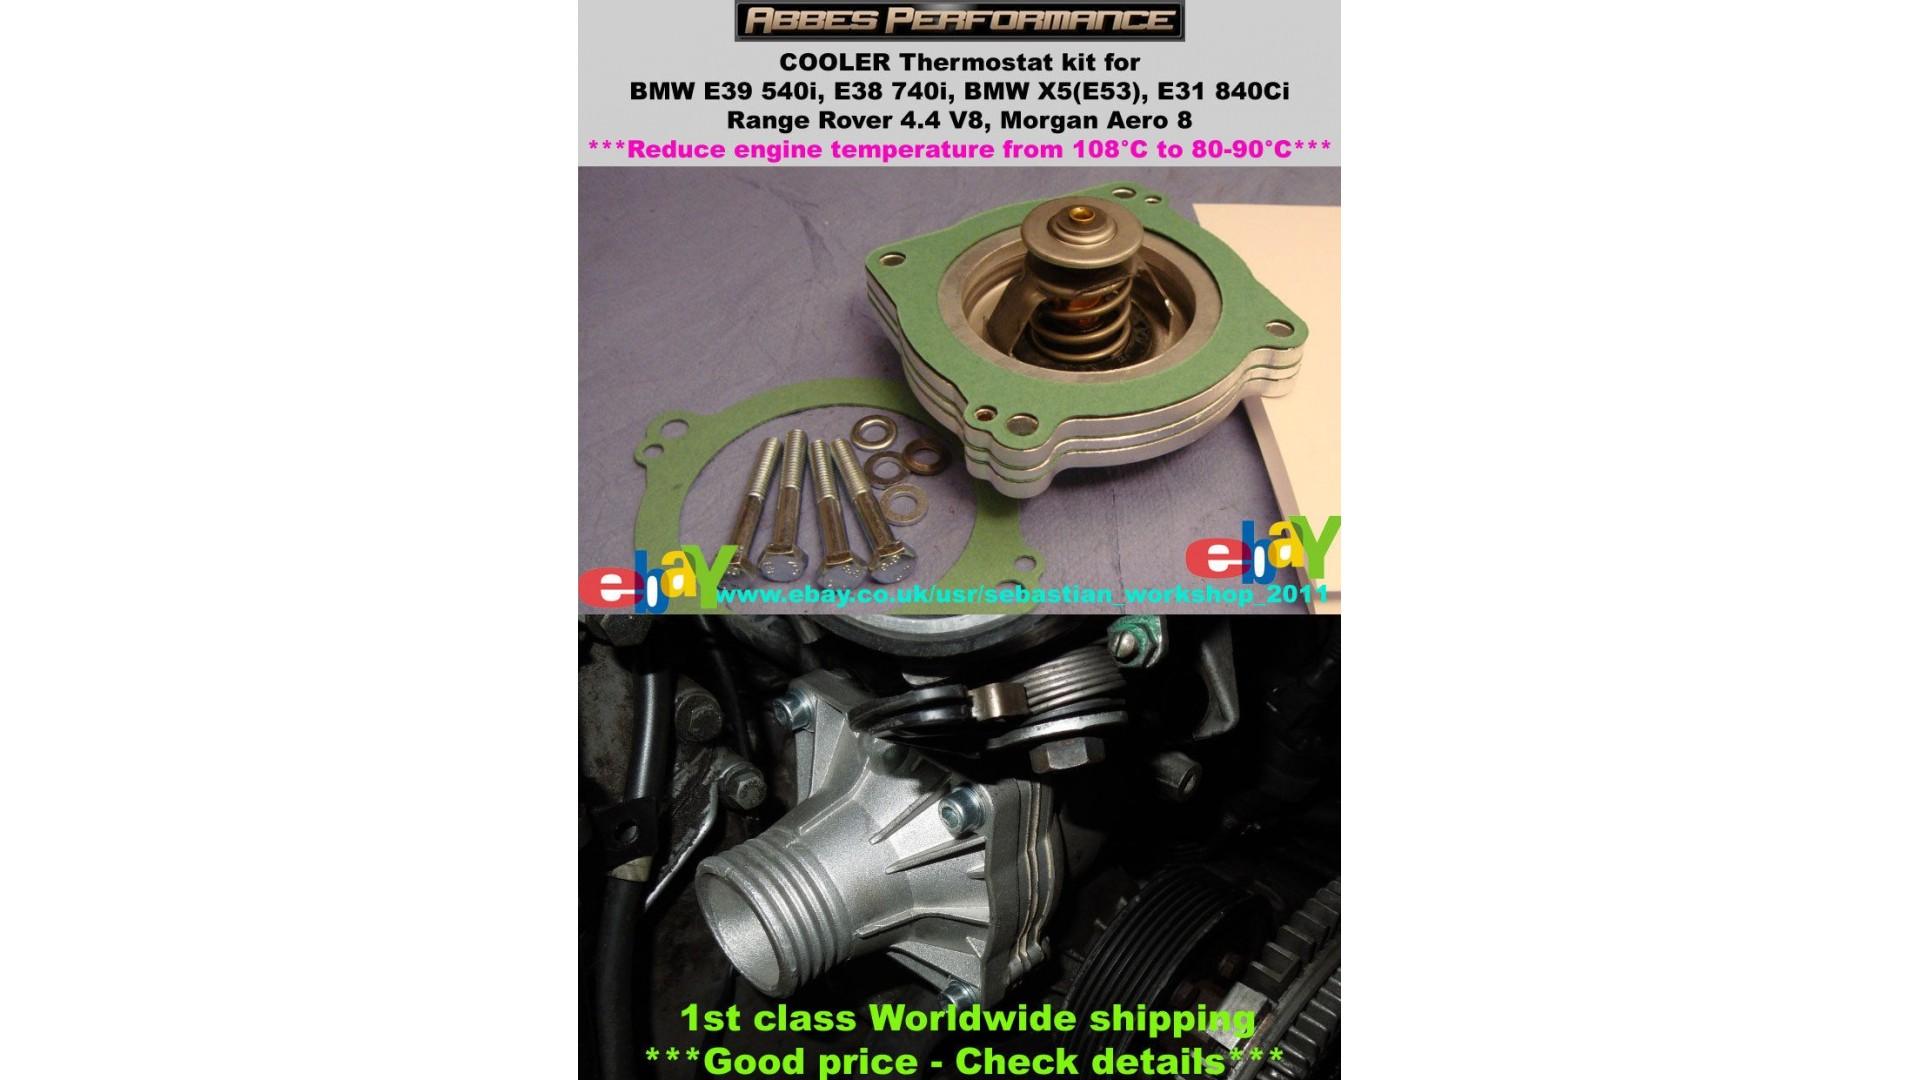 80c Thermostat Kit For Bmw E39 540i E38 740i X5 Z8 E52 M62 Range 740il Engine Wiring Harness Reduce